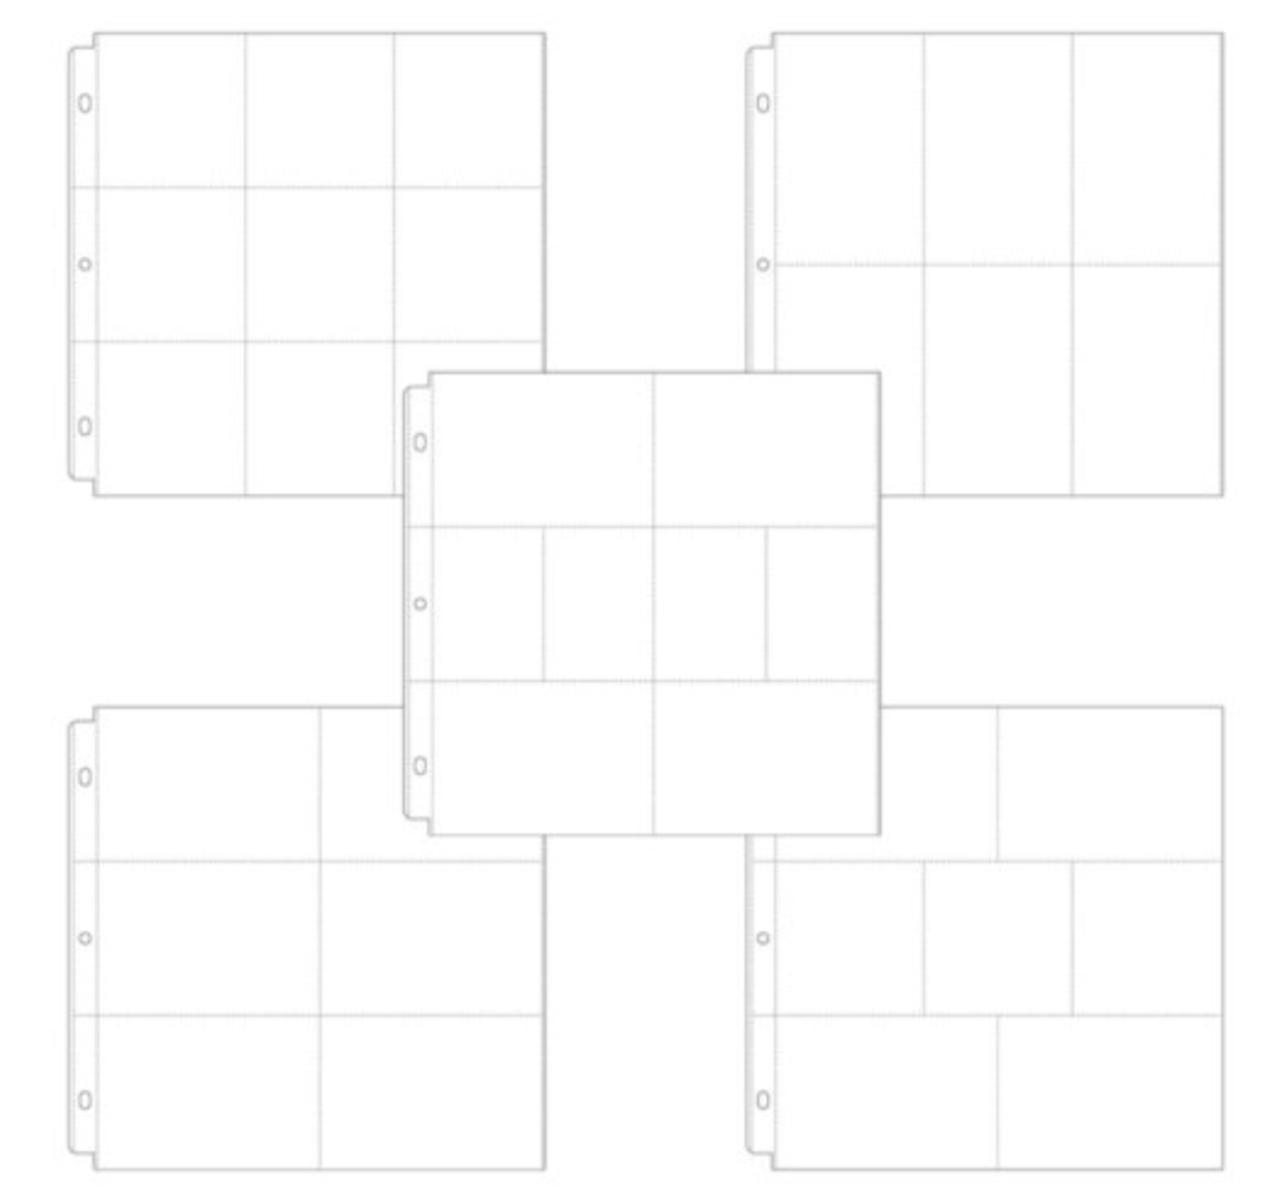 Protetor de Paginas Scrapbook.com 30x30 cm - 12x12 in - Kit com 10 Embalagem Sortida - Project Life - Kit 2